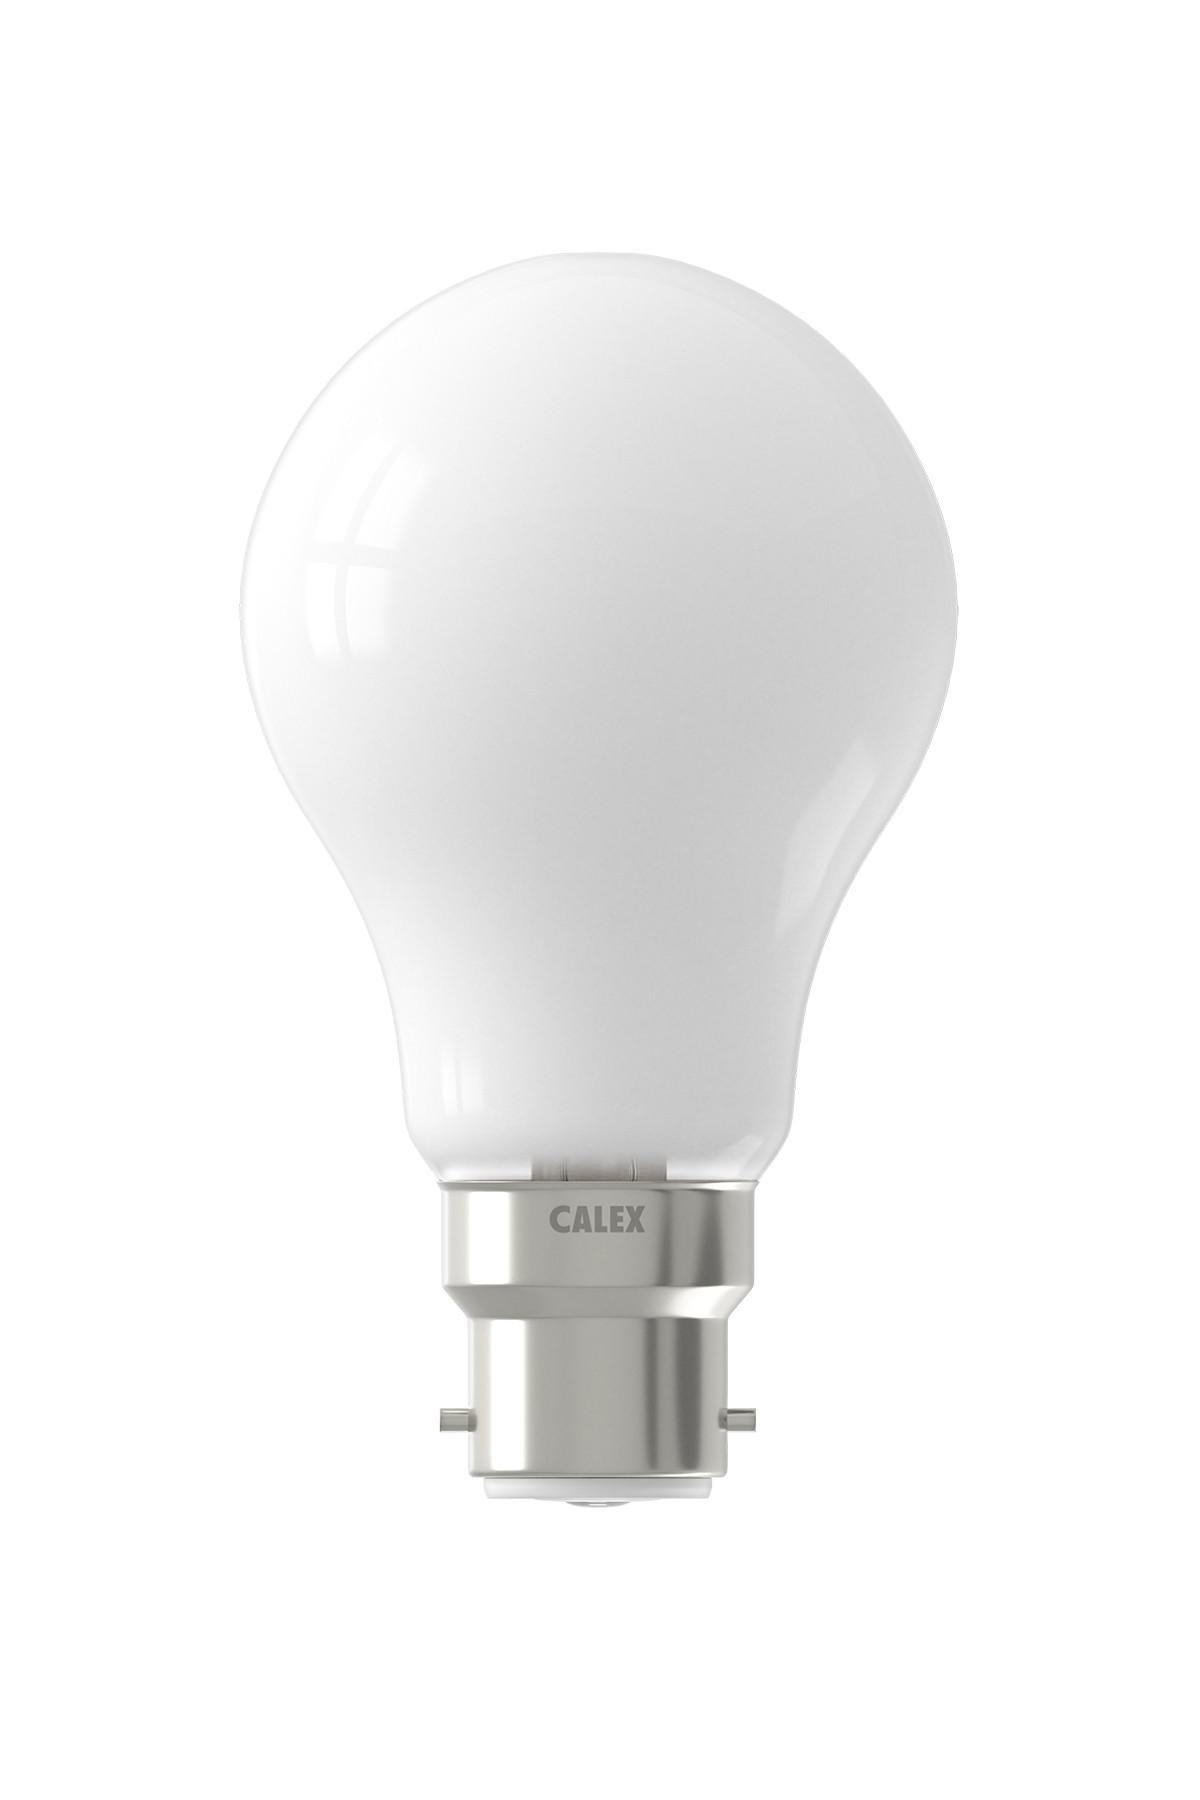 Calex LED volglas Filament Standaardlamp  220-240V 7W 810lm B22 A60, Softline 2700K CRI80 Dimbaar